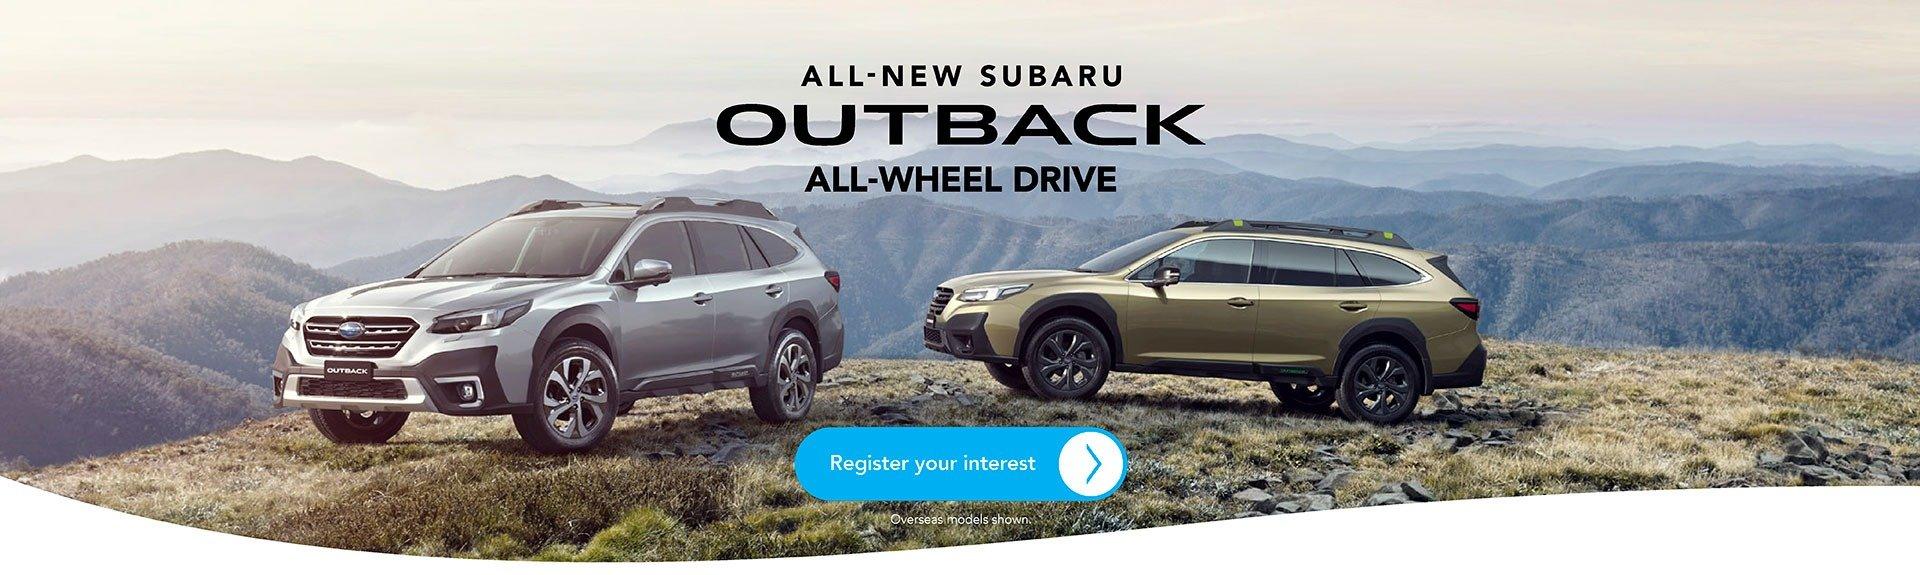 All New Subaru Outback